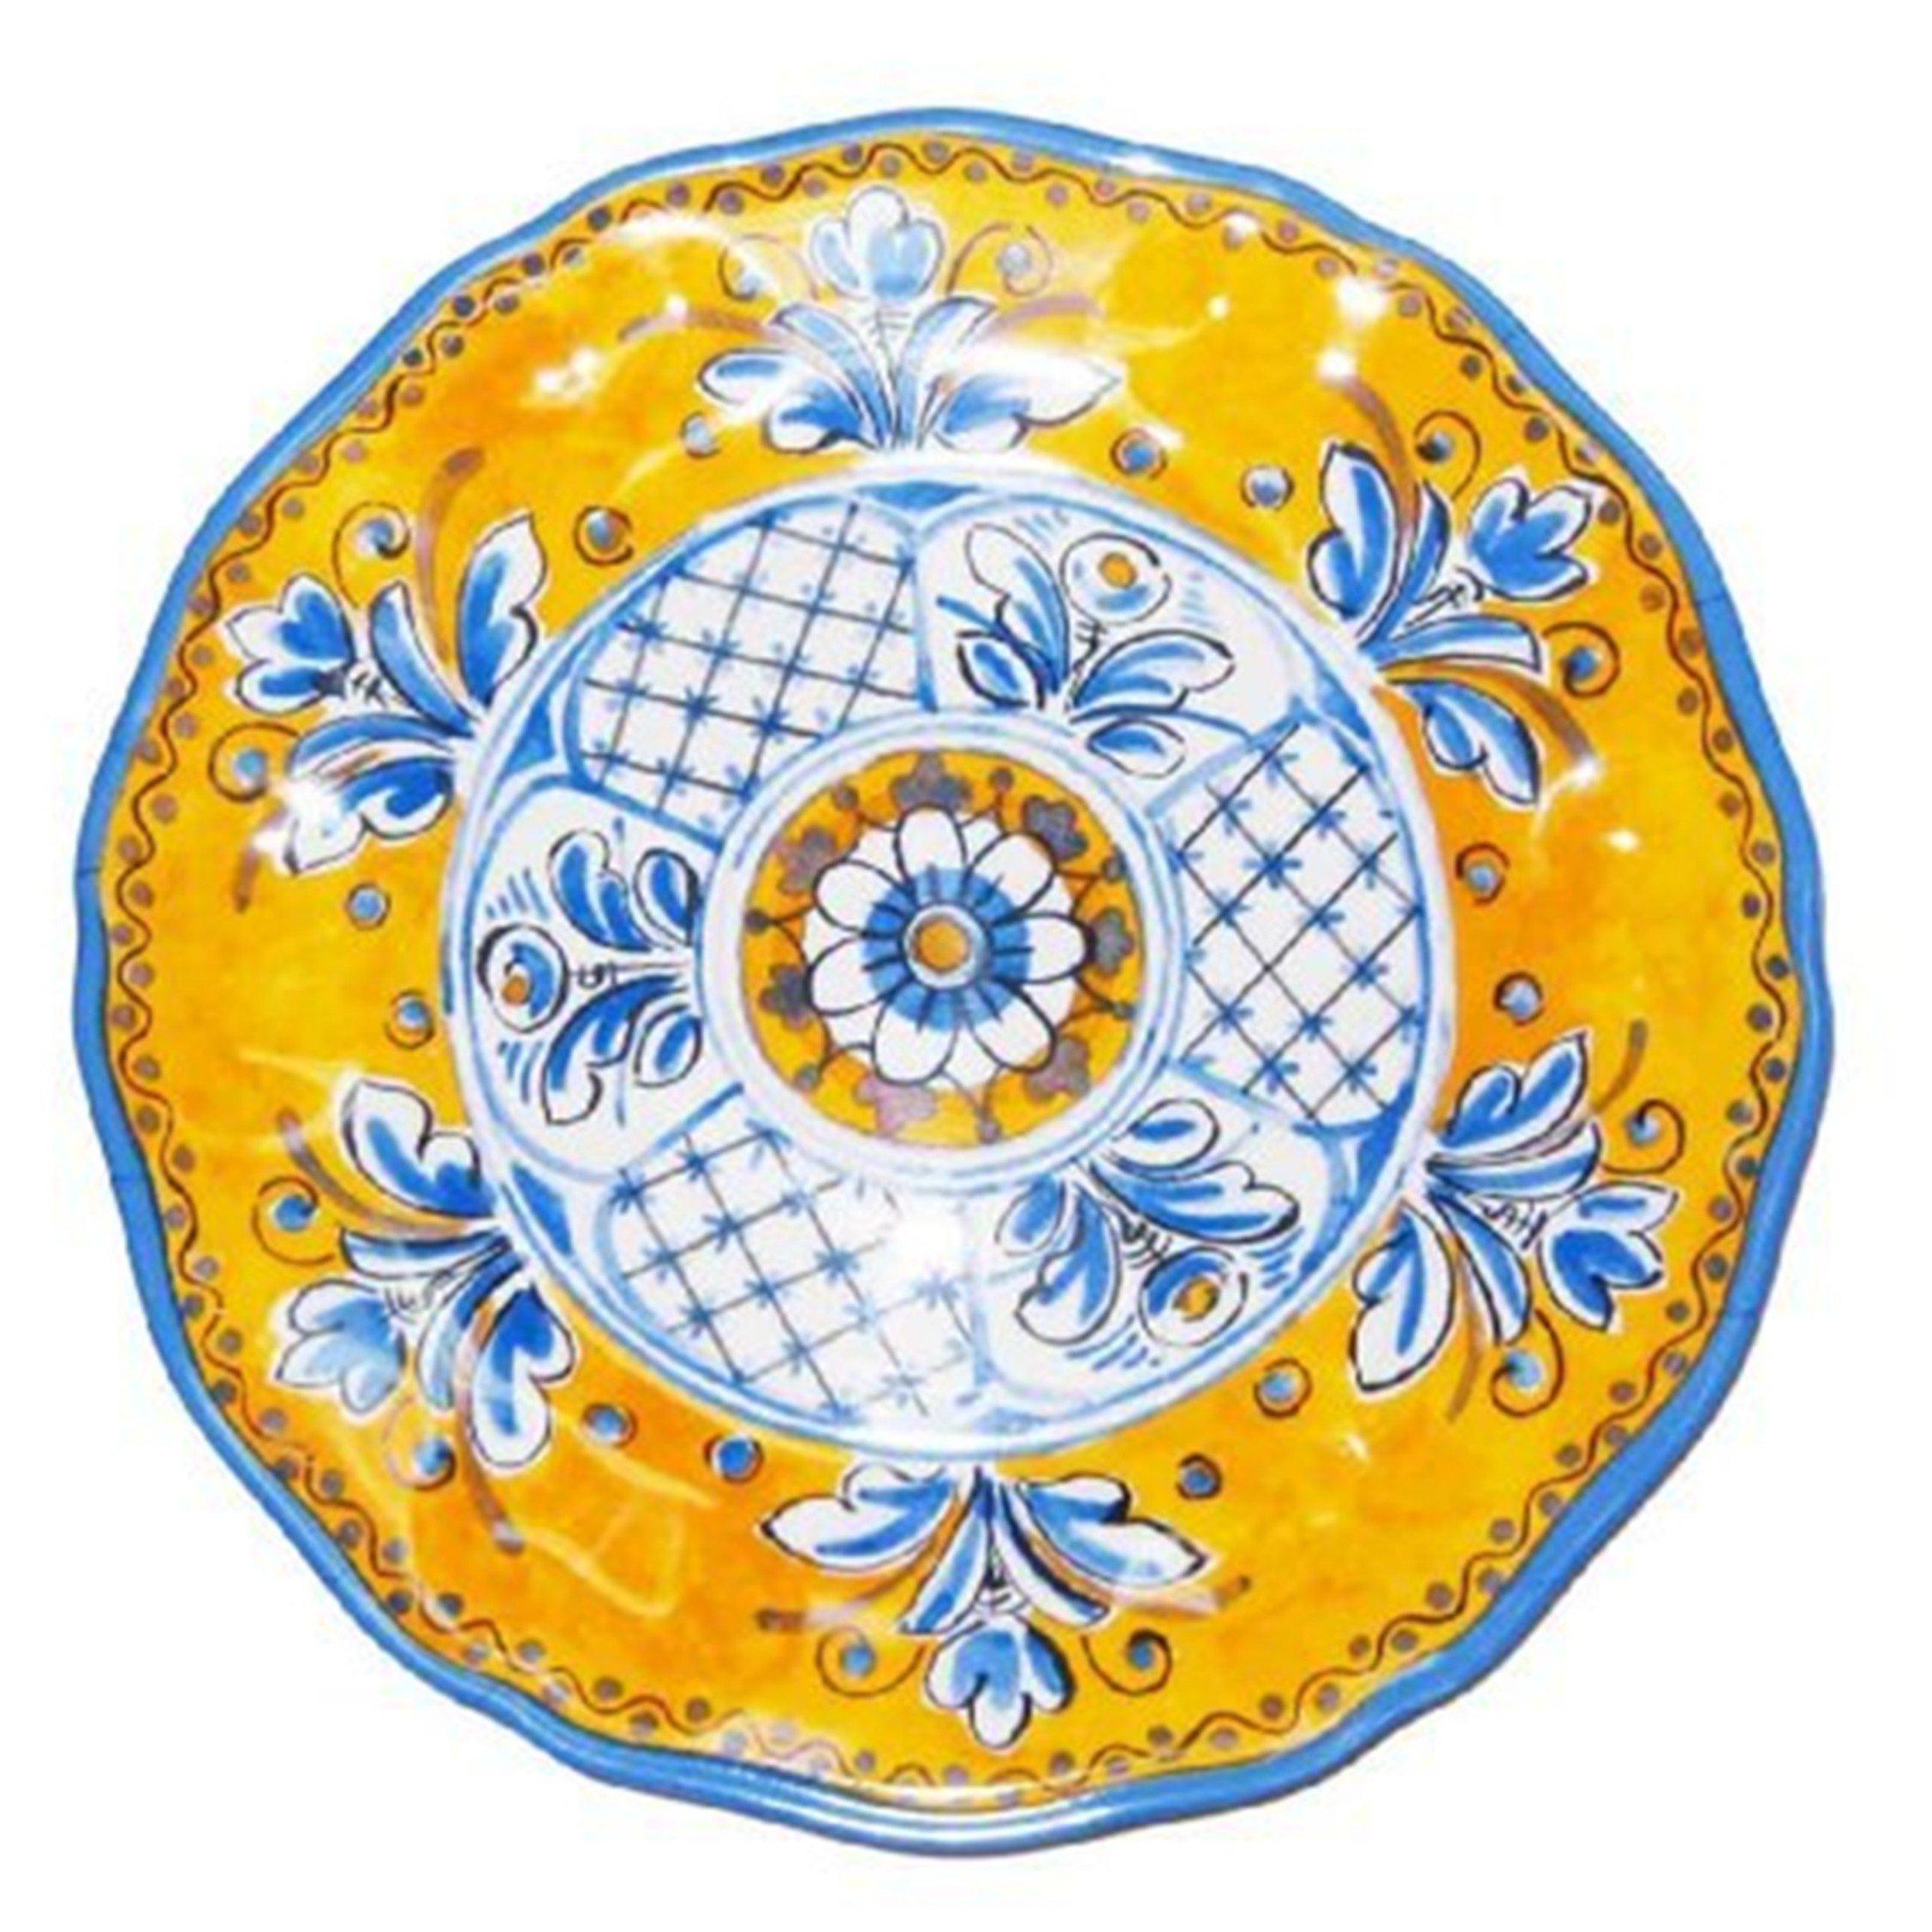 Le Cadeaux Benidorm 11'' Melamine Dinner Plate - set of 4